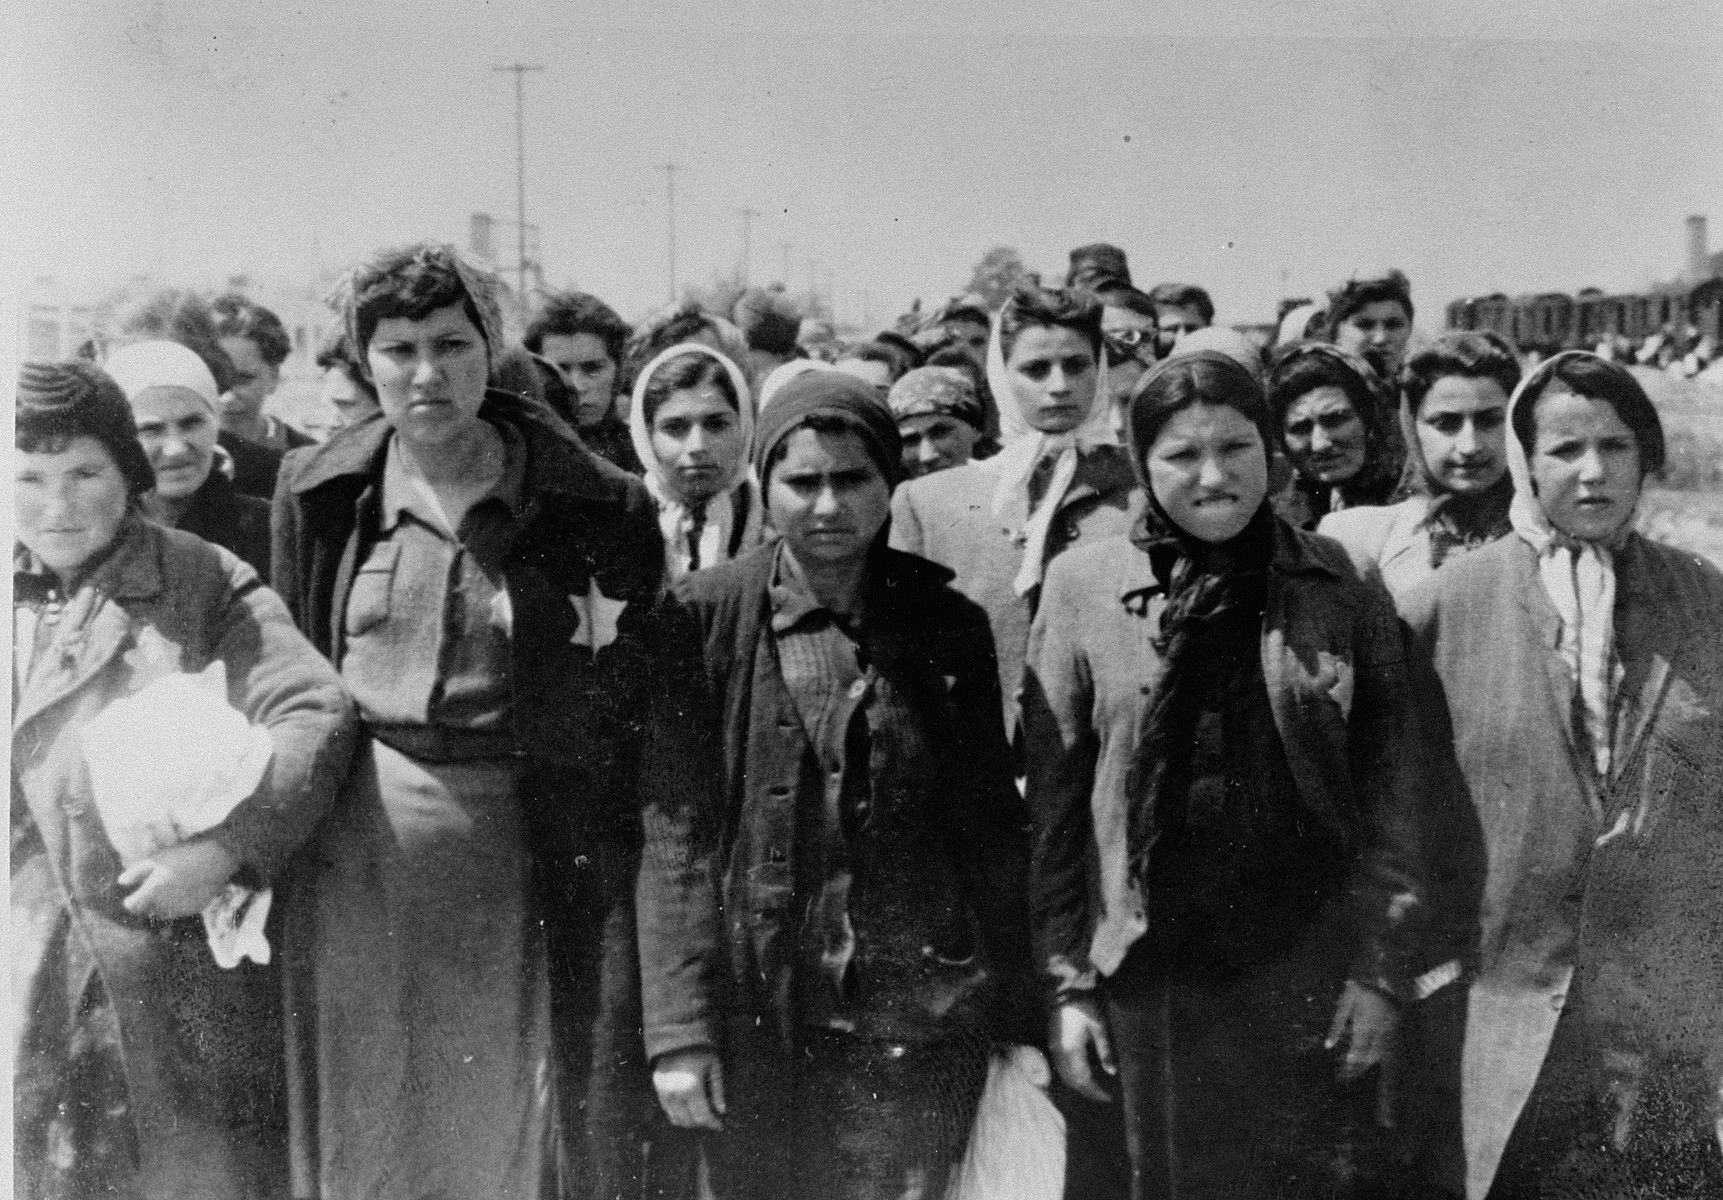 Jewish women from Subcarpathian Rus who have been selected for forced labor at Auschwitz-Birkenau, wait to be taken to another section of the camp.  From left to right (front row) are Laye Moshkovics Gruenglass, Etya Moshkovics, Schprintza Moshkovics Steiner, Zehava Edelstein Avineri, and Margit Edelstein Eckerman.  Laye, Etya and Schprintza were the daughters of Rabbi Shmuel Moshkovics.  Zehava and Margit were twins.  In the second row are Piri, Ester and Blanka Simsovics.